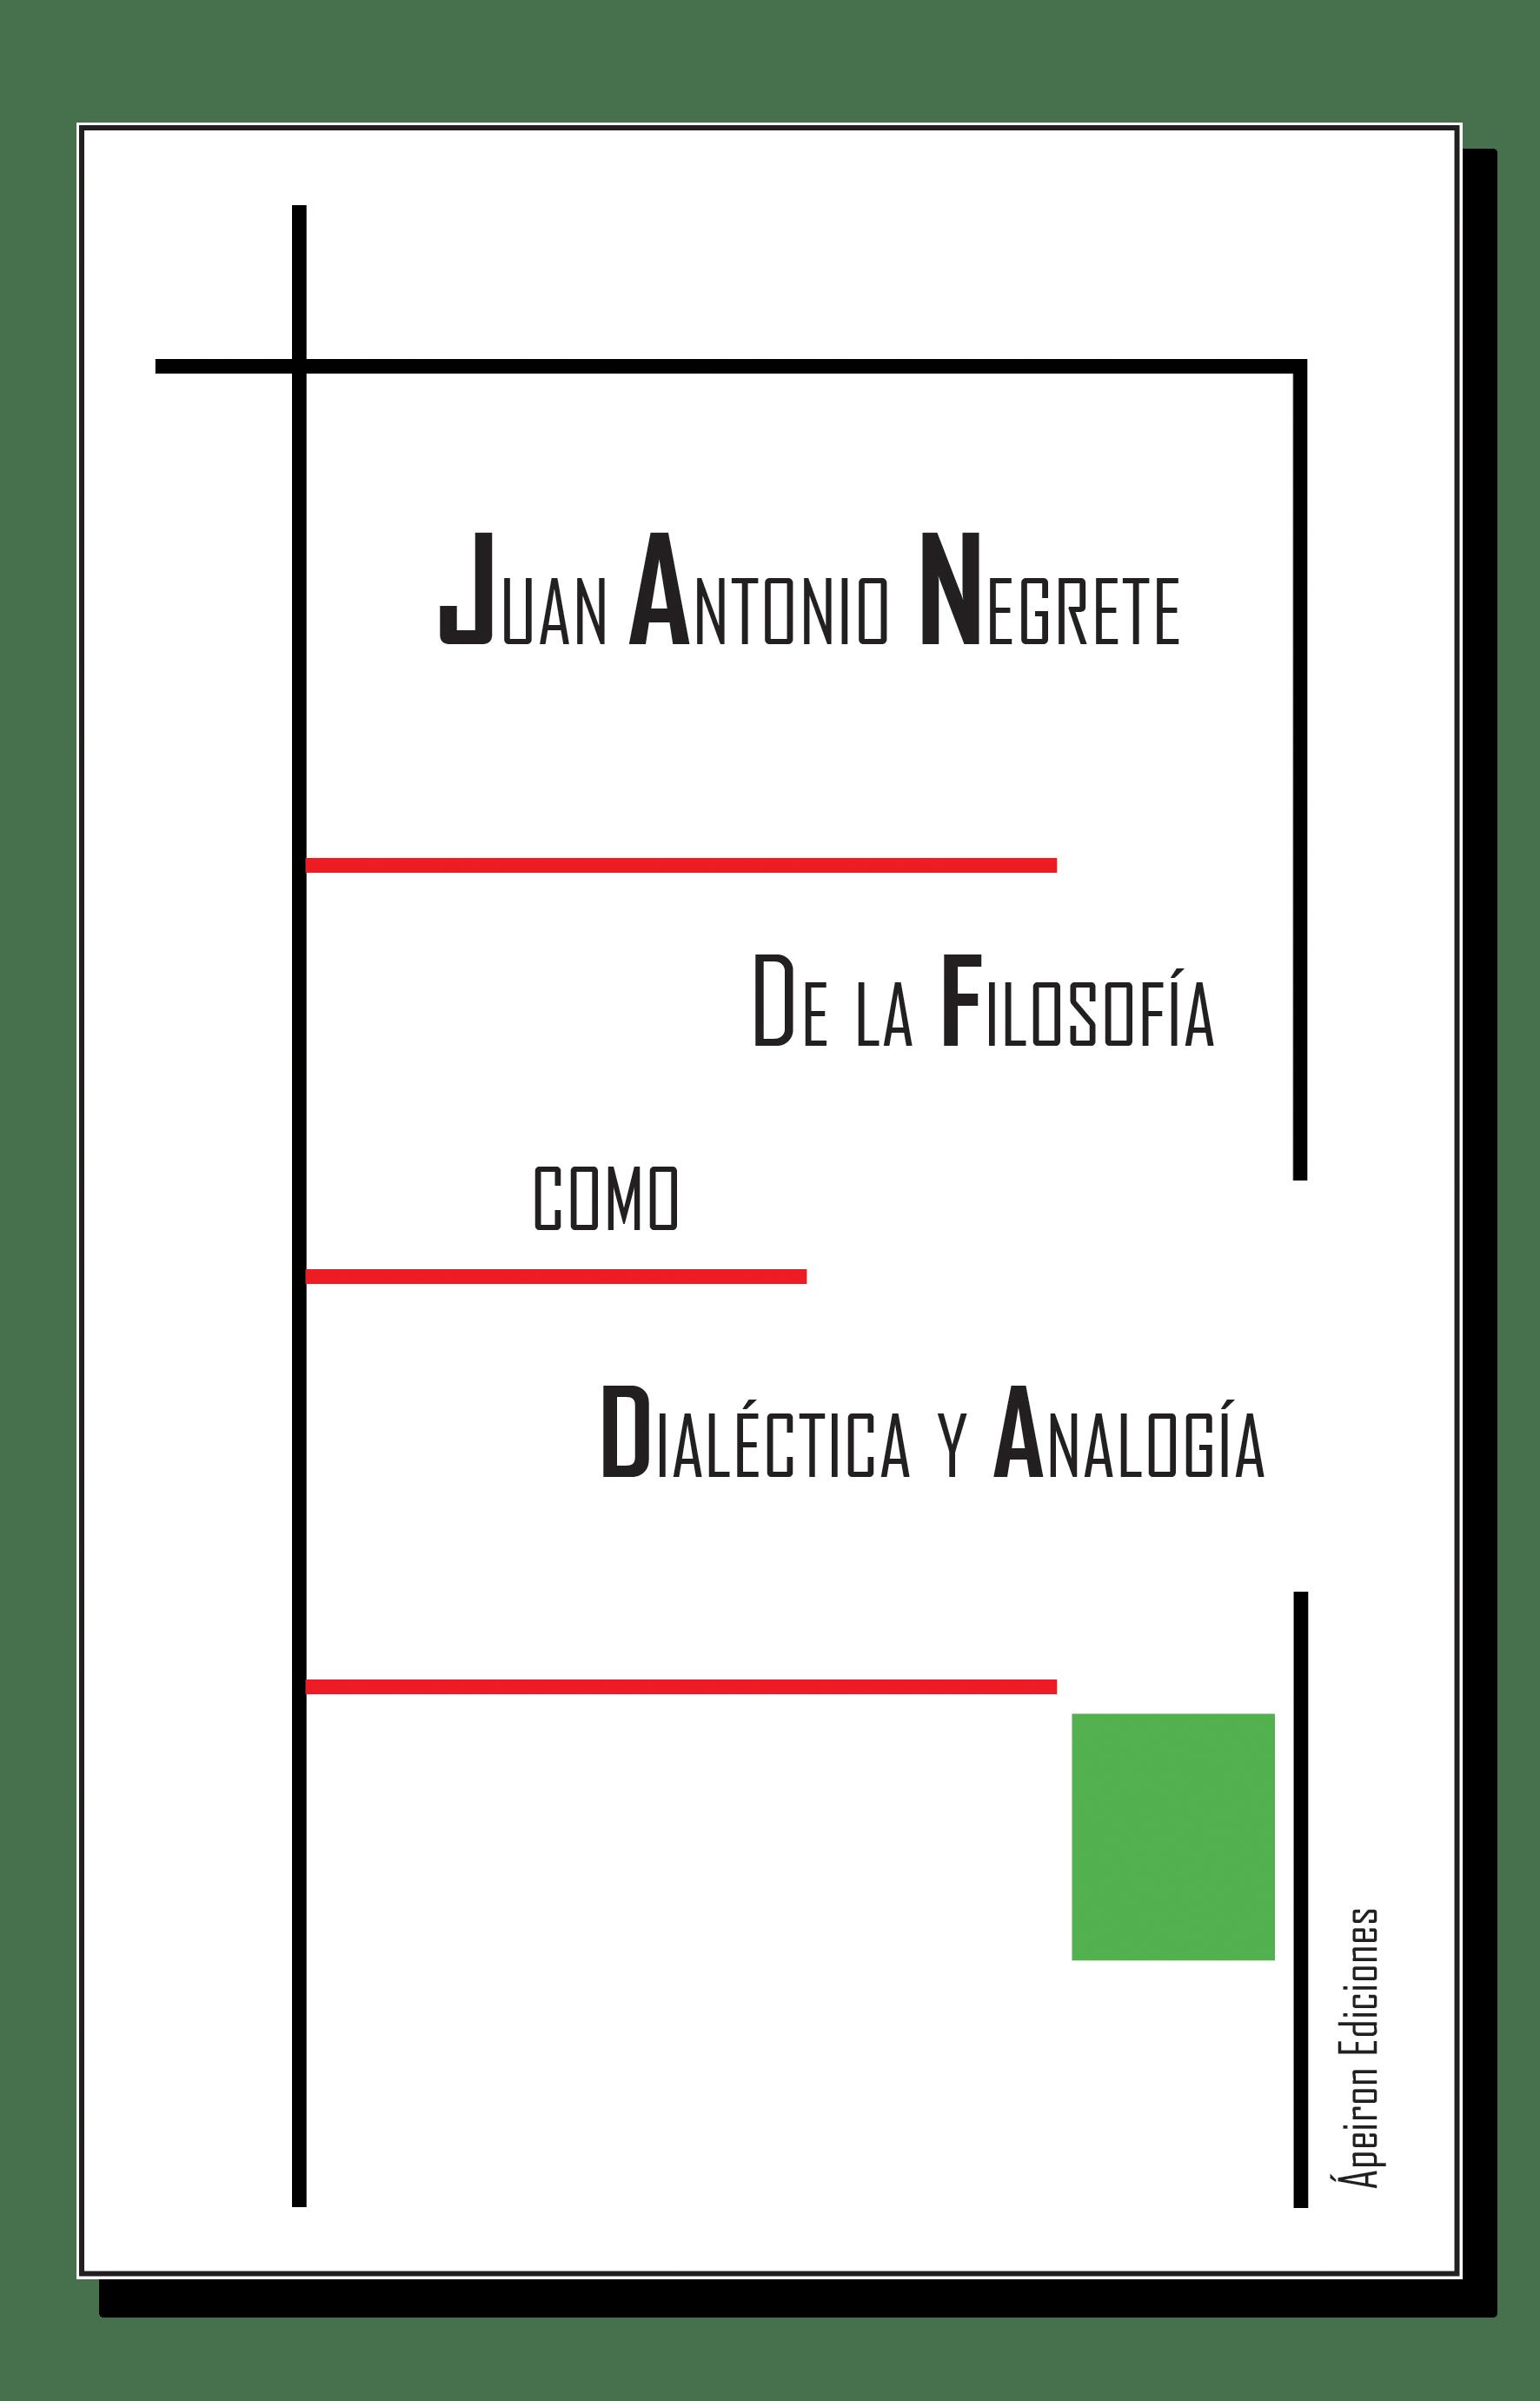 foto 4 libro Juan Antonio Negrete Alcudia